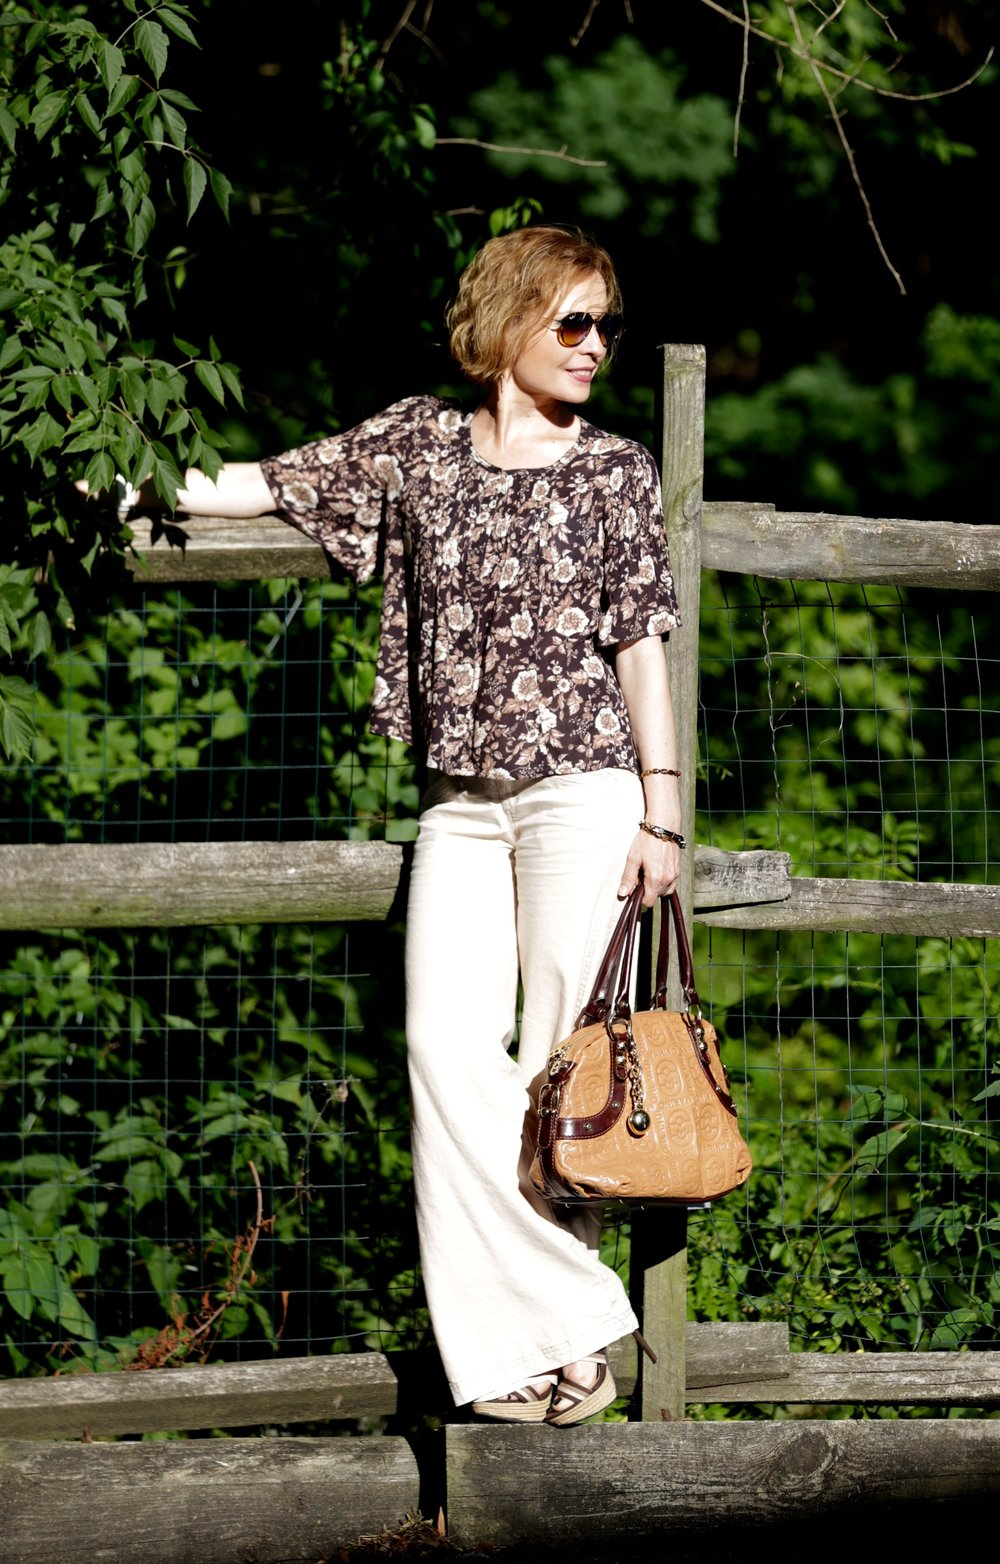 Women's Fashion Inspiration,Summer Fashion Blog,Summer Fashion Inspiration,Women's Summer Style,July Fashion,Russian Fashion Blogger,Tatiana Moskatova 6